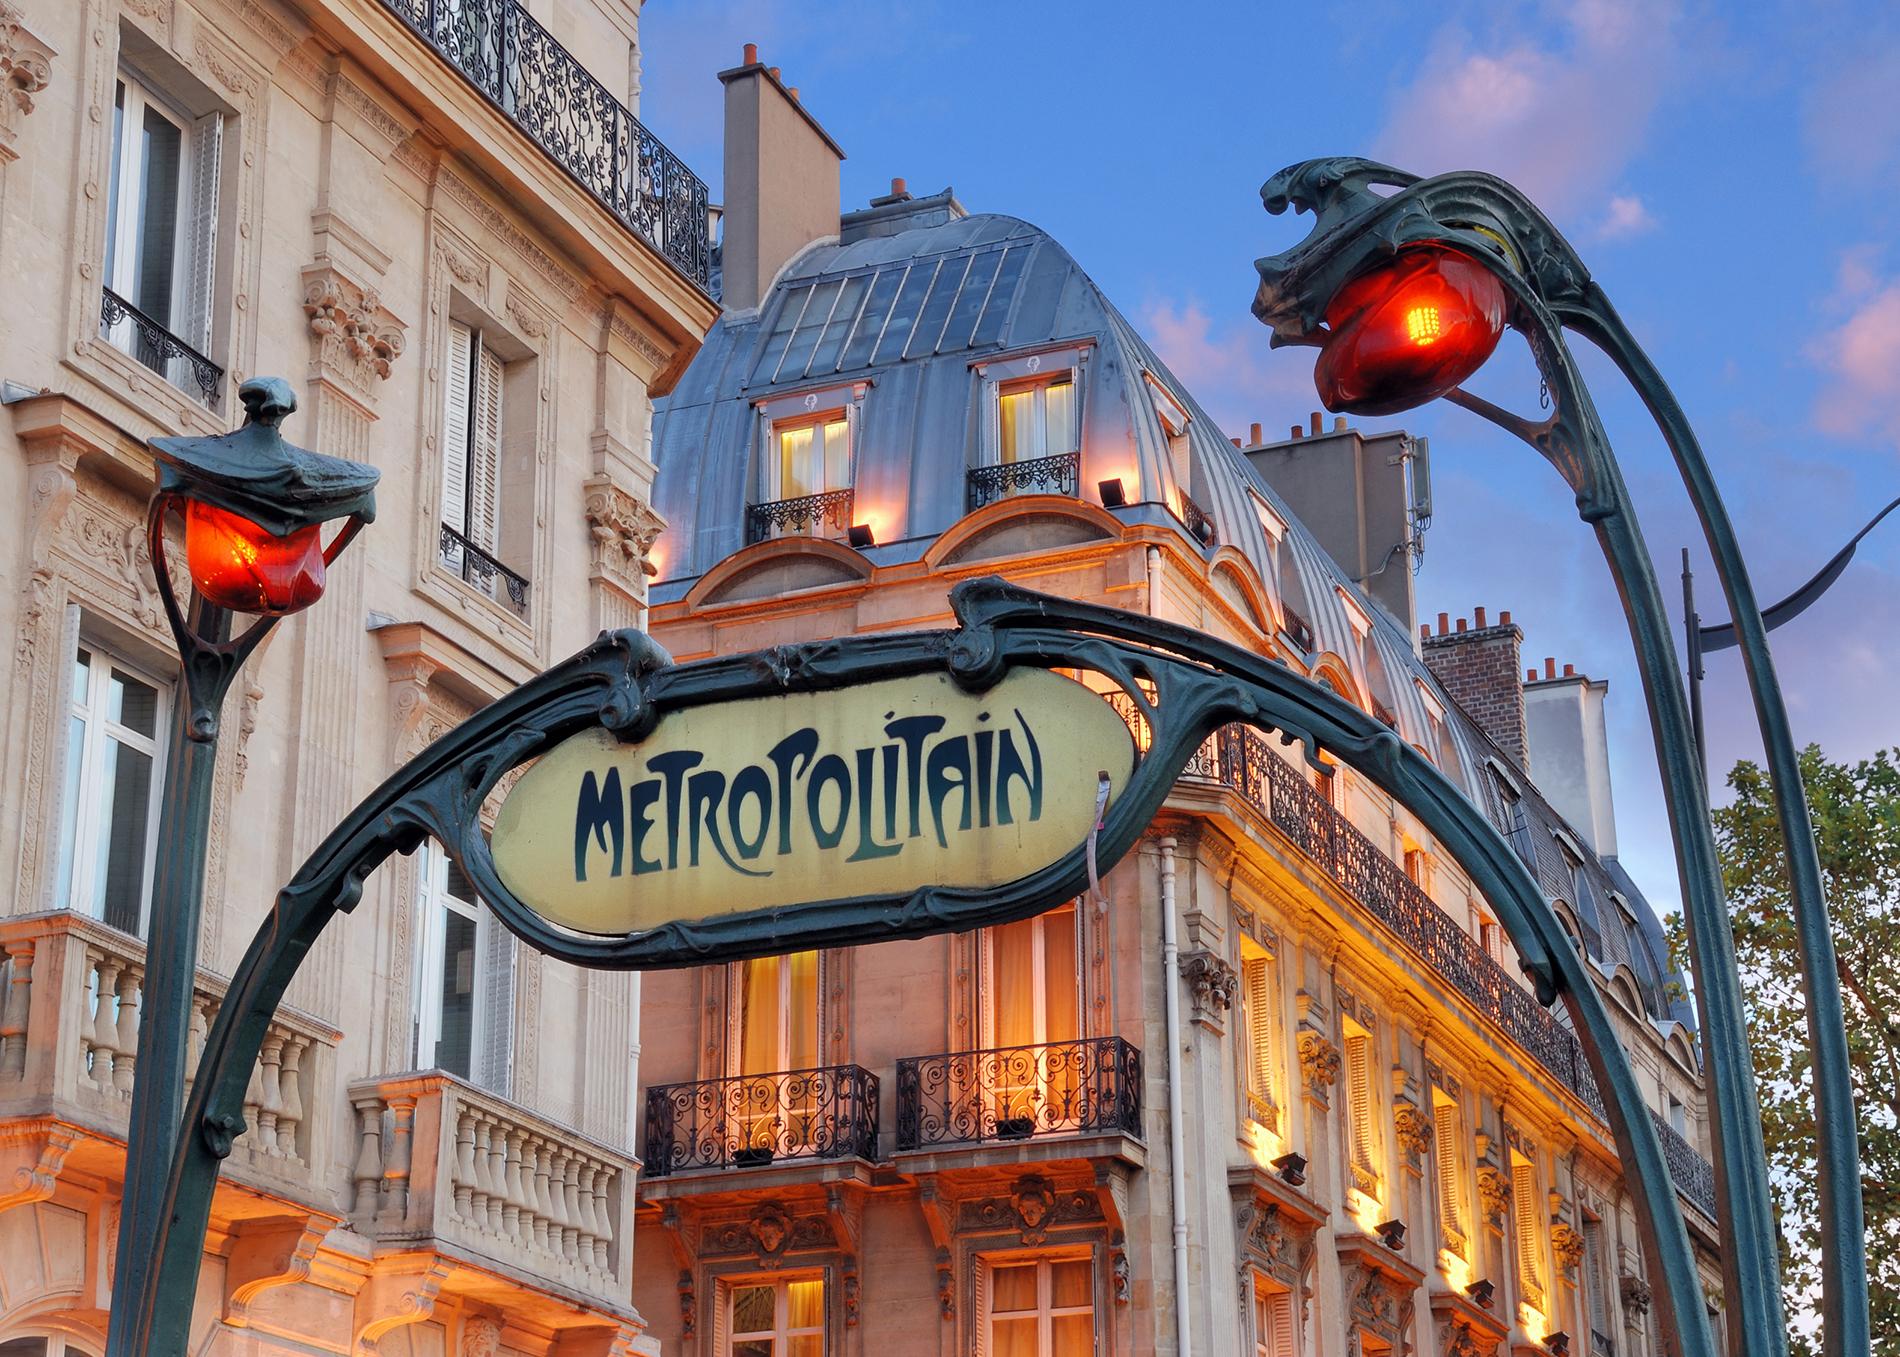 paris metropolitain sign